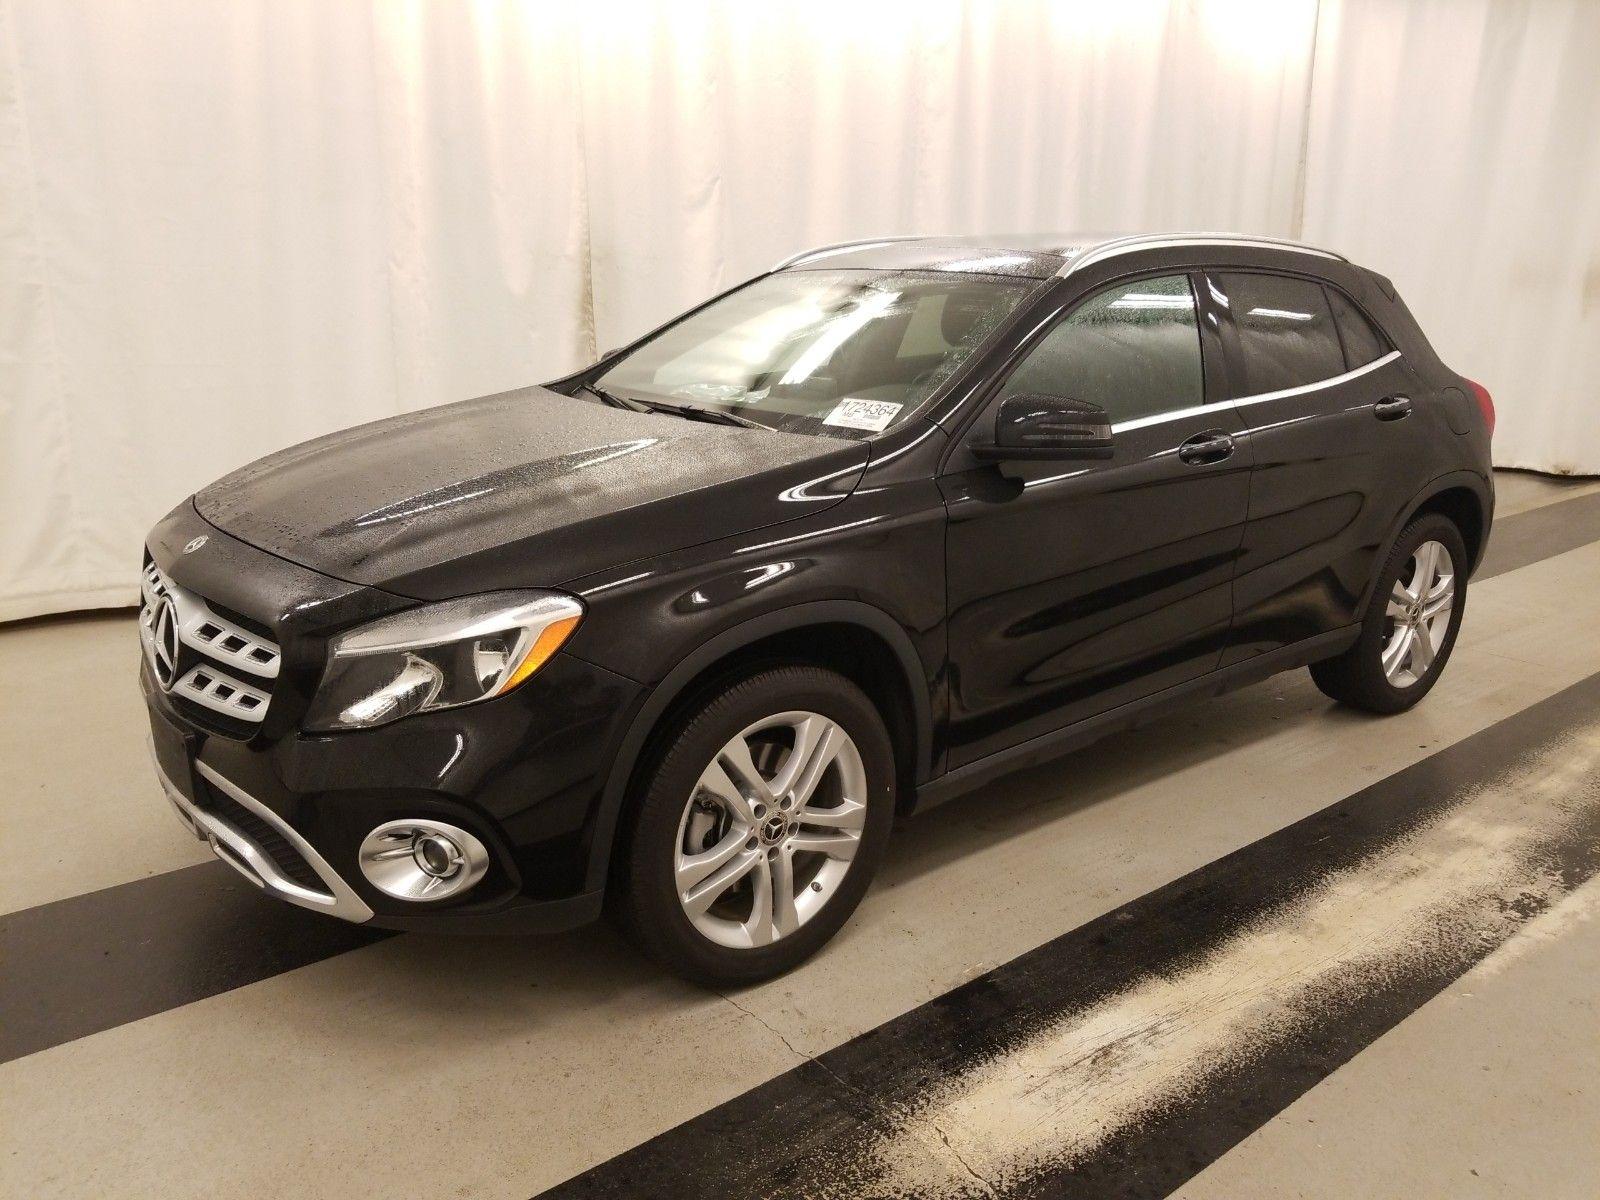 2018 Mercedes-benz Gla 2.0. Lot 99912166868 Vin WDCTG4EB3JJ415295